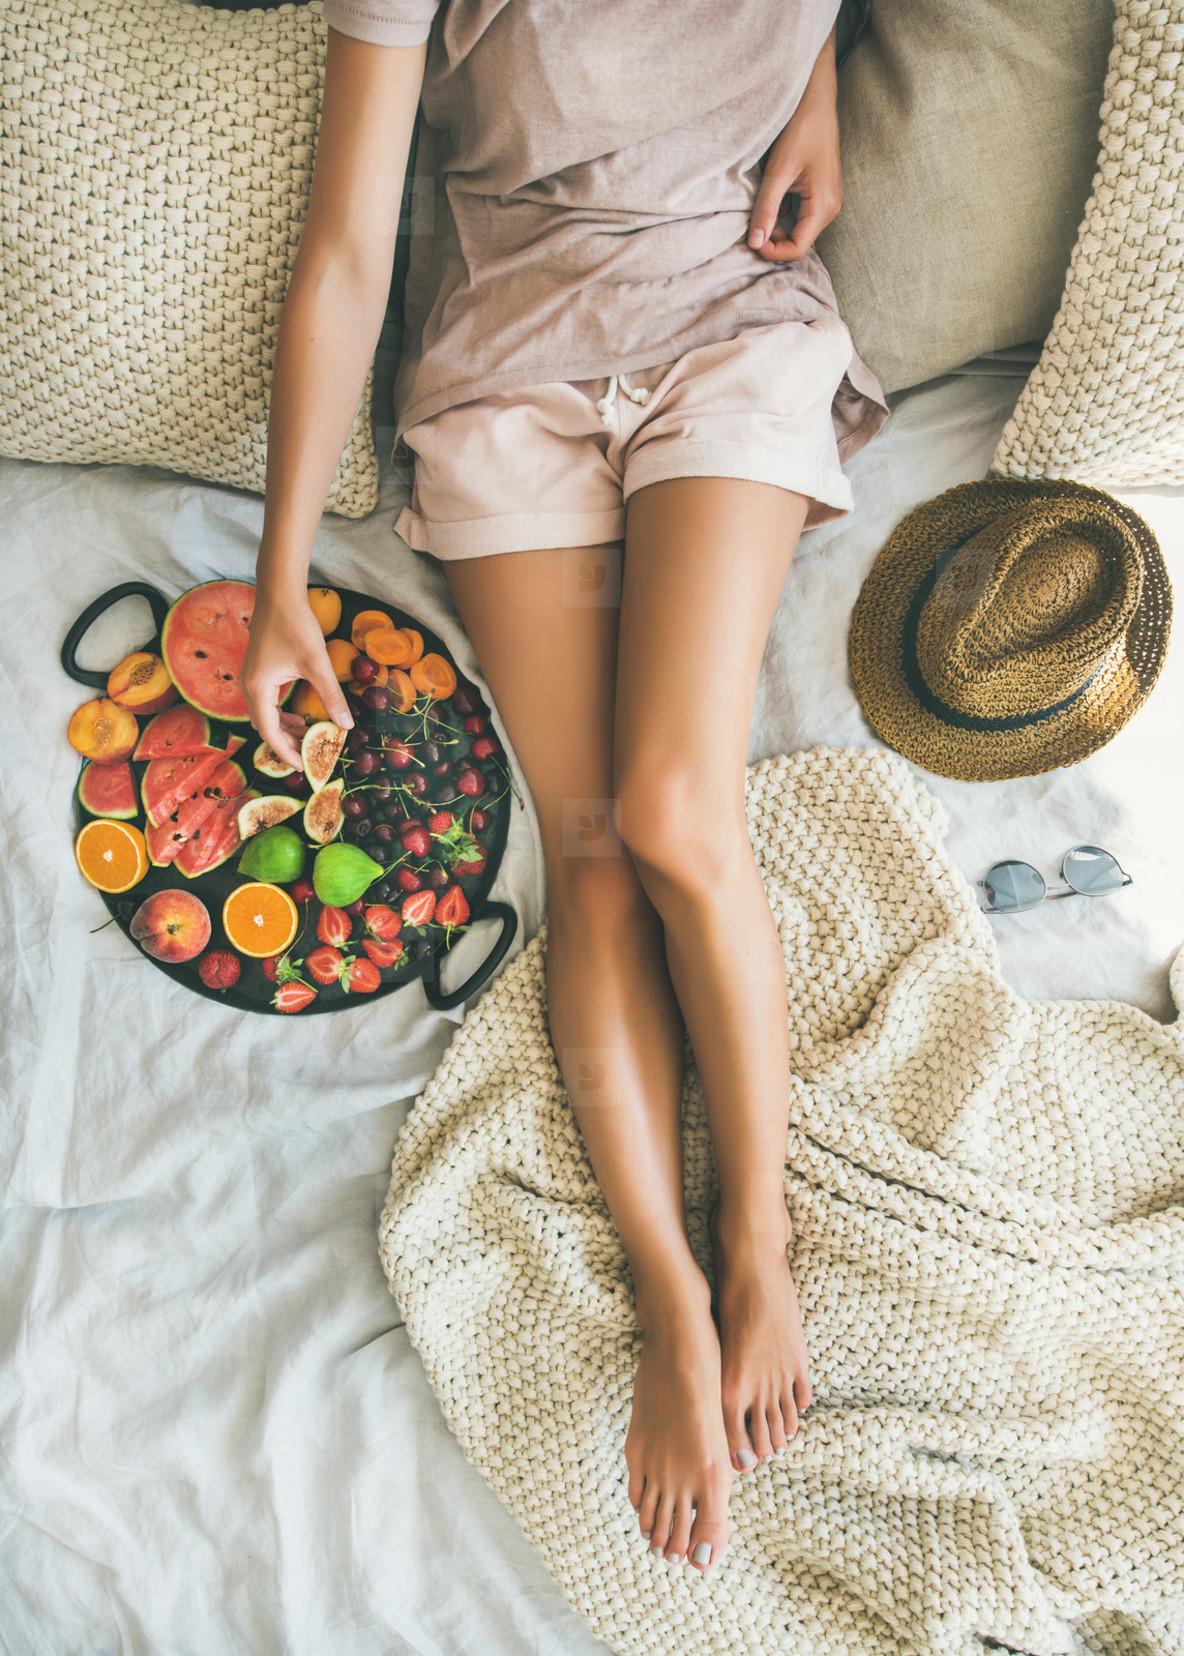 Summer healthy raw vegan clean eating breakfast in bed concept